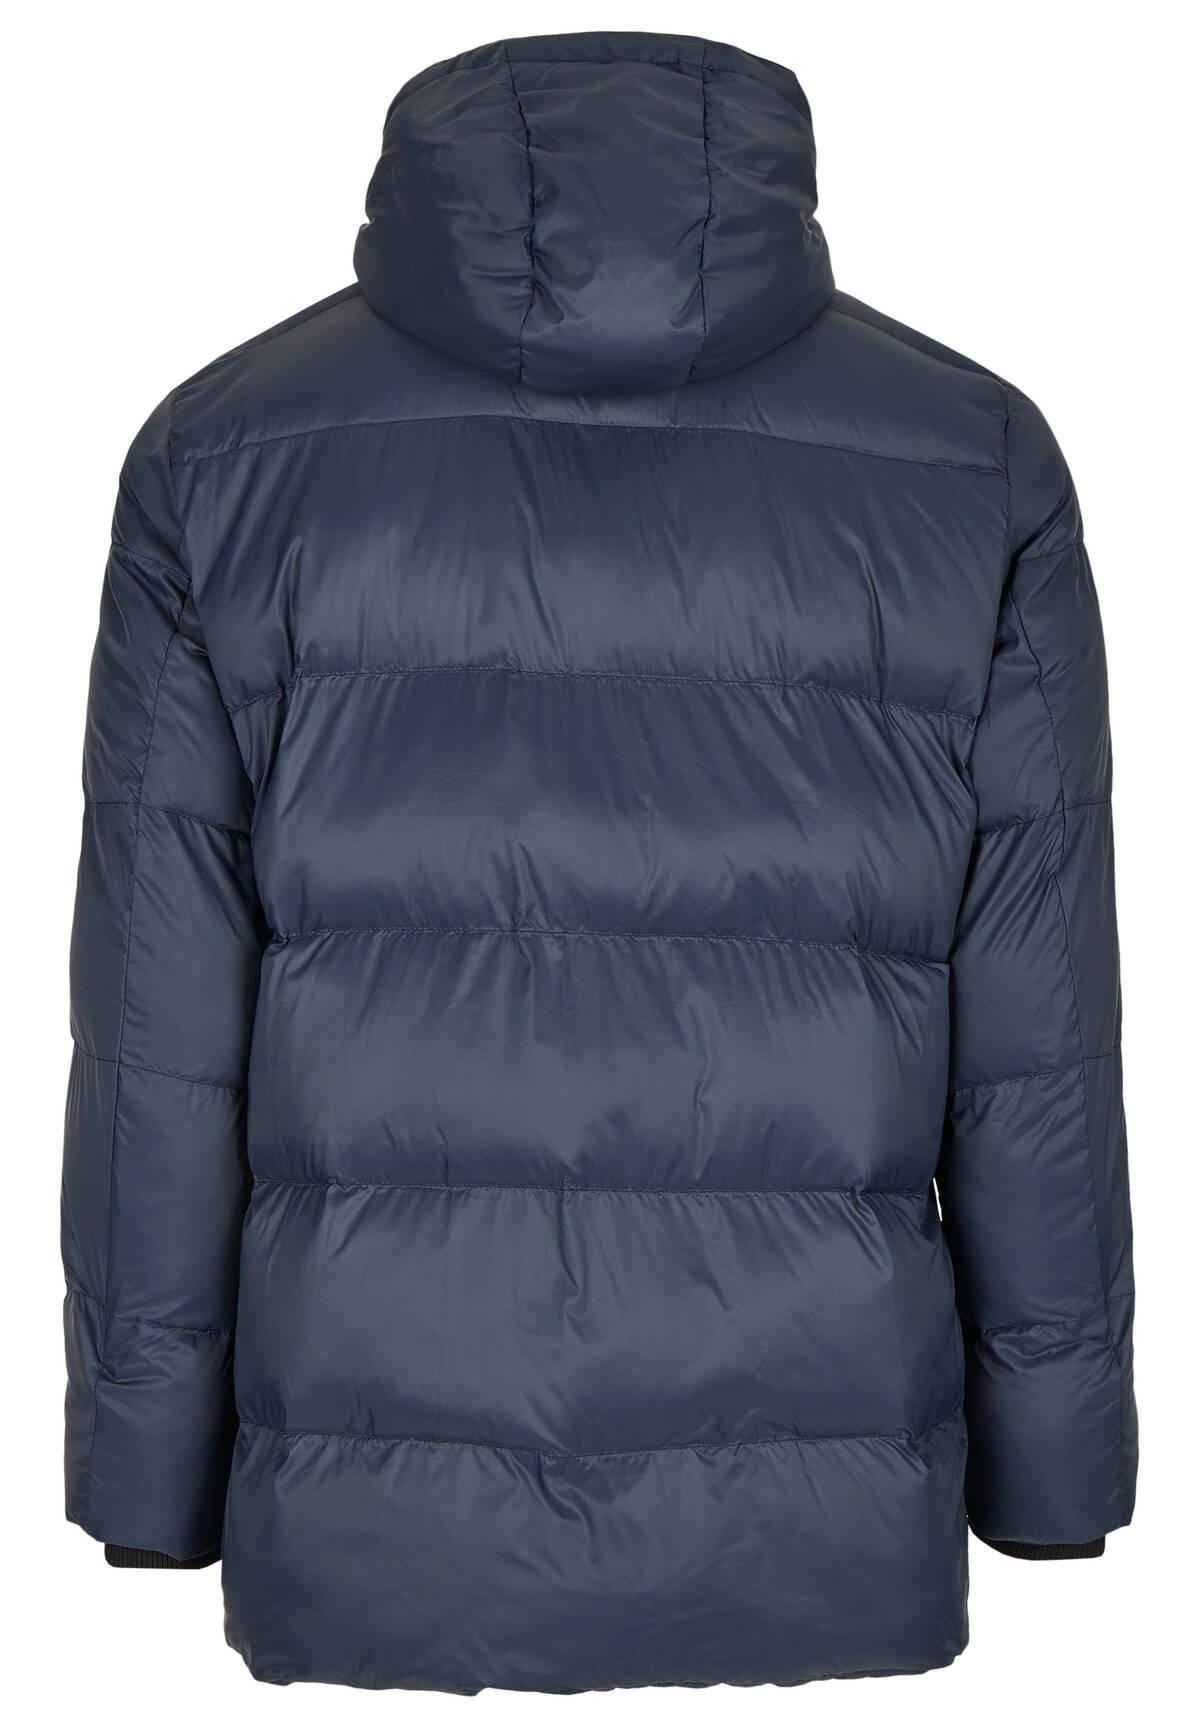 DH-ECO Jacke aus recycelten Materialien / JACKET